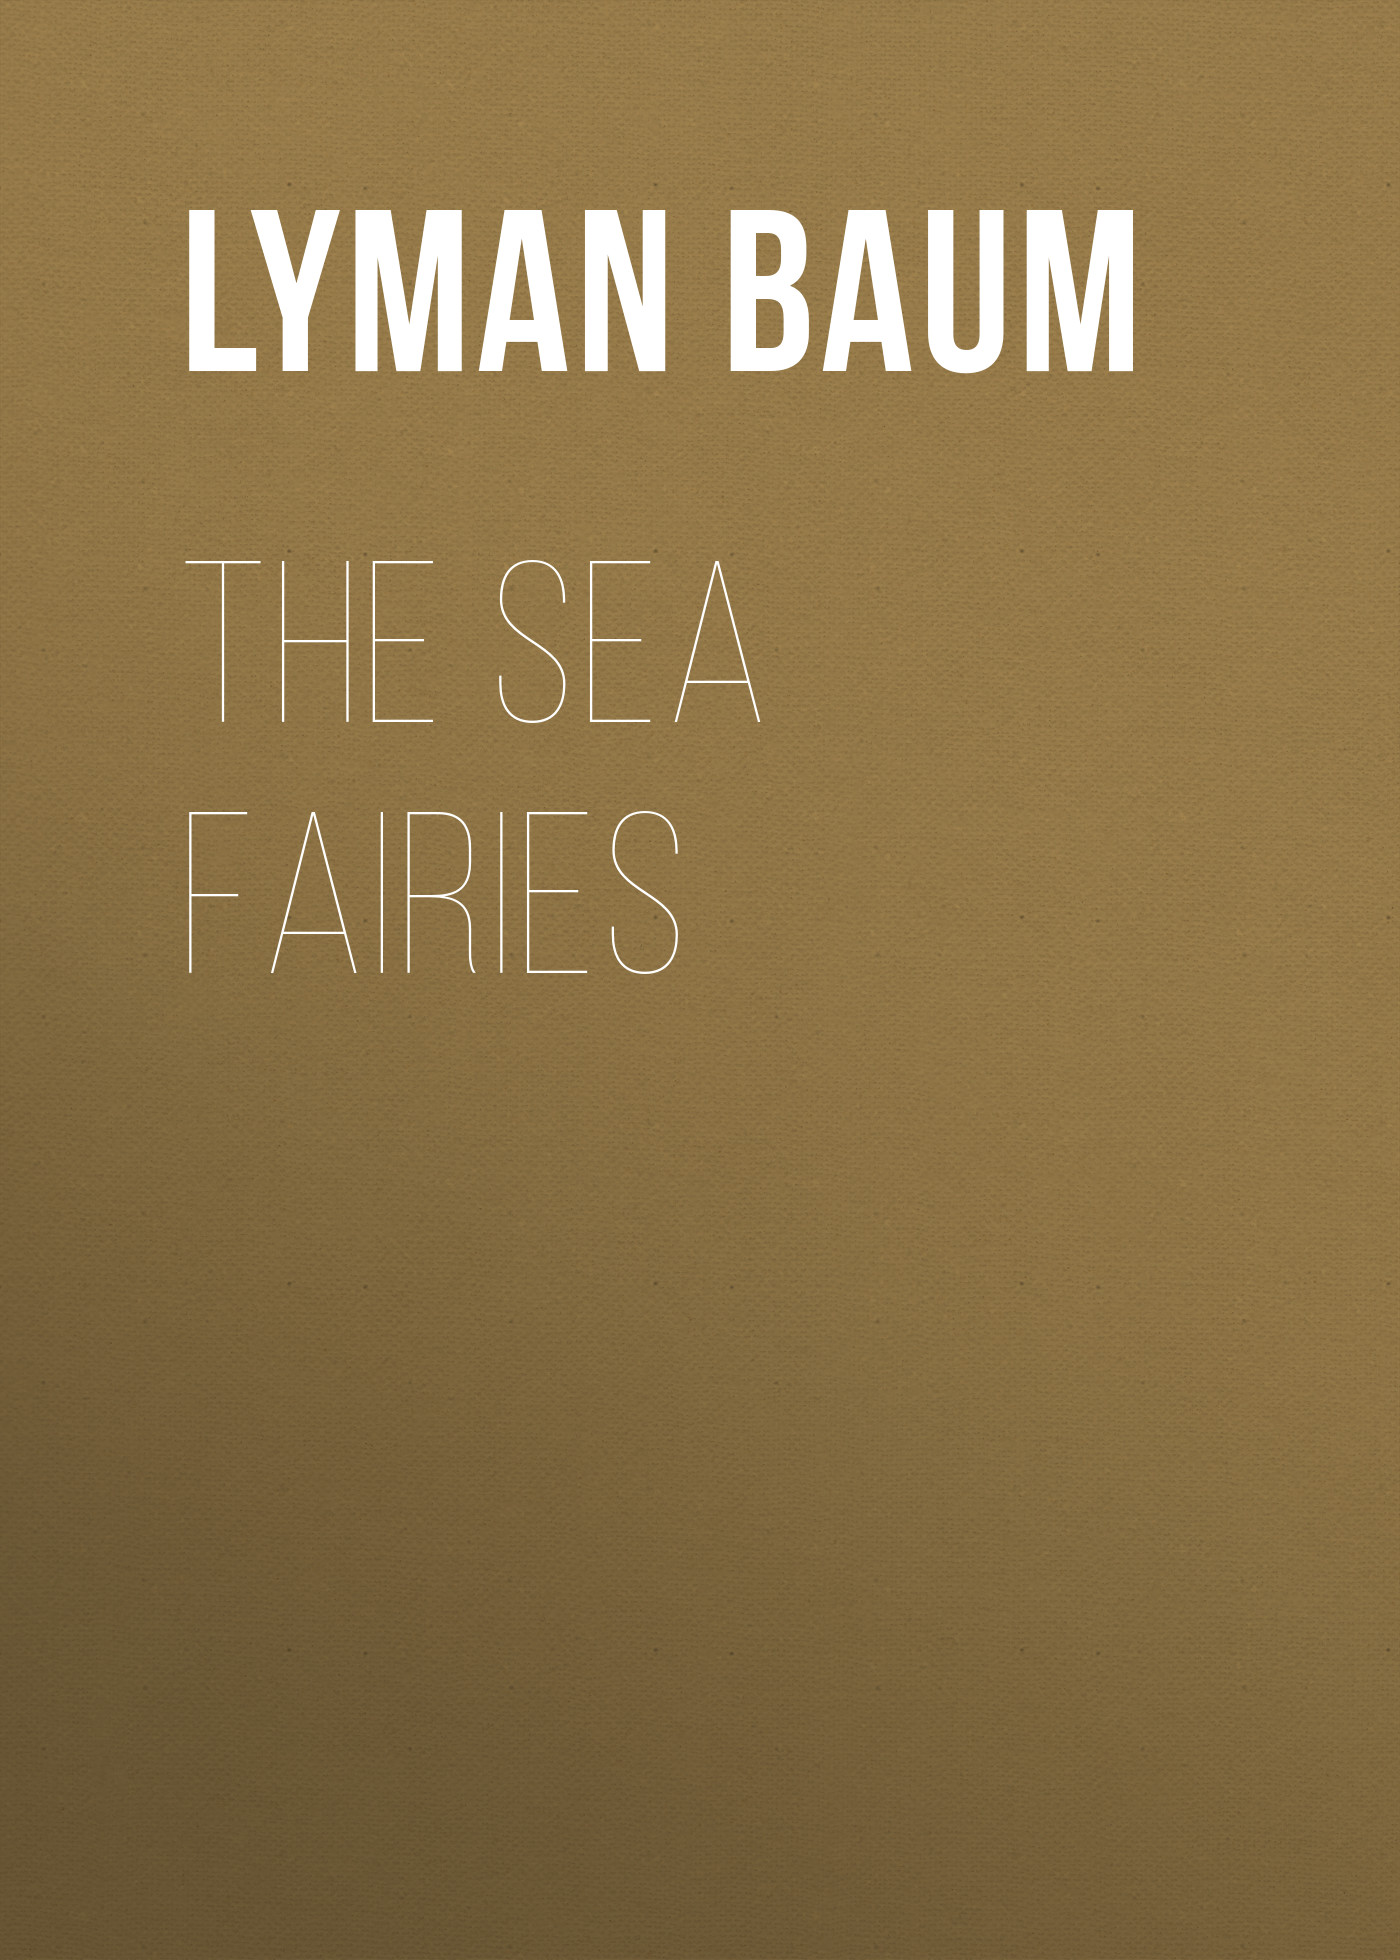 все цены на Лаймен Фрэнк Баум The Sea Fairies